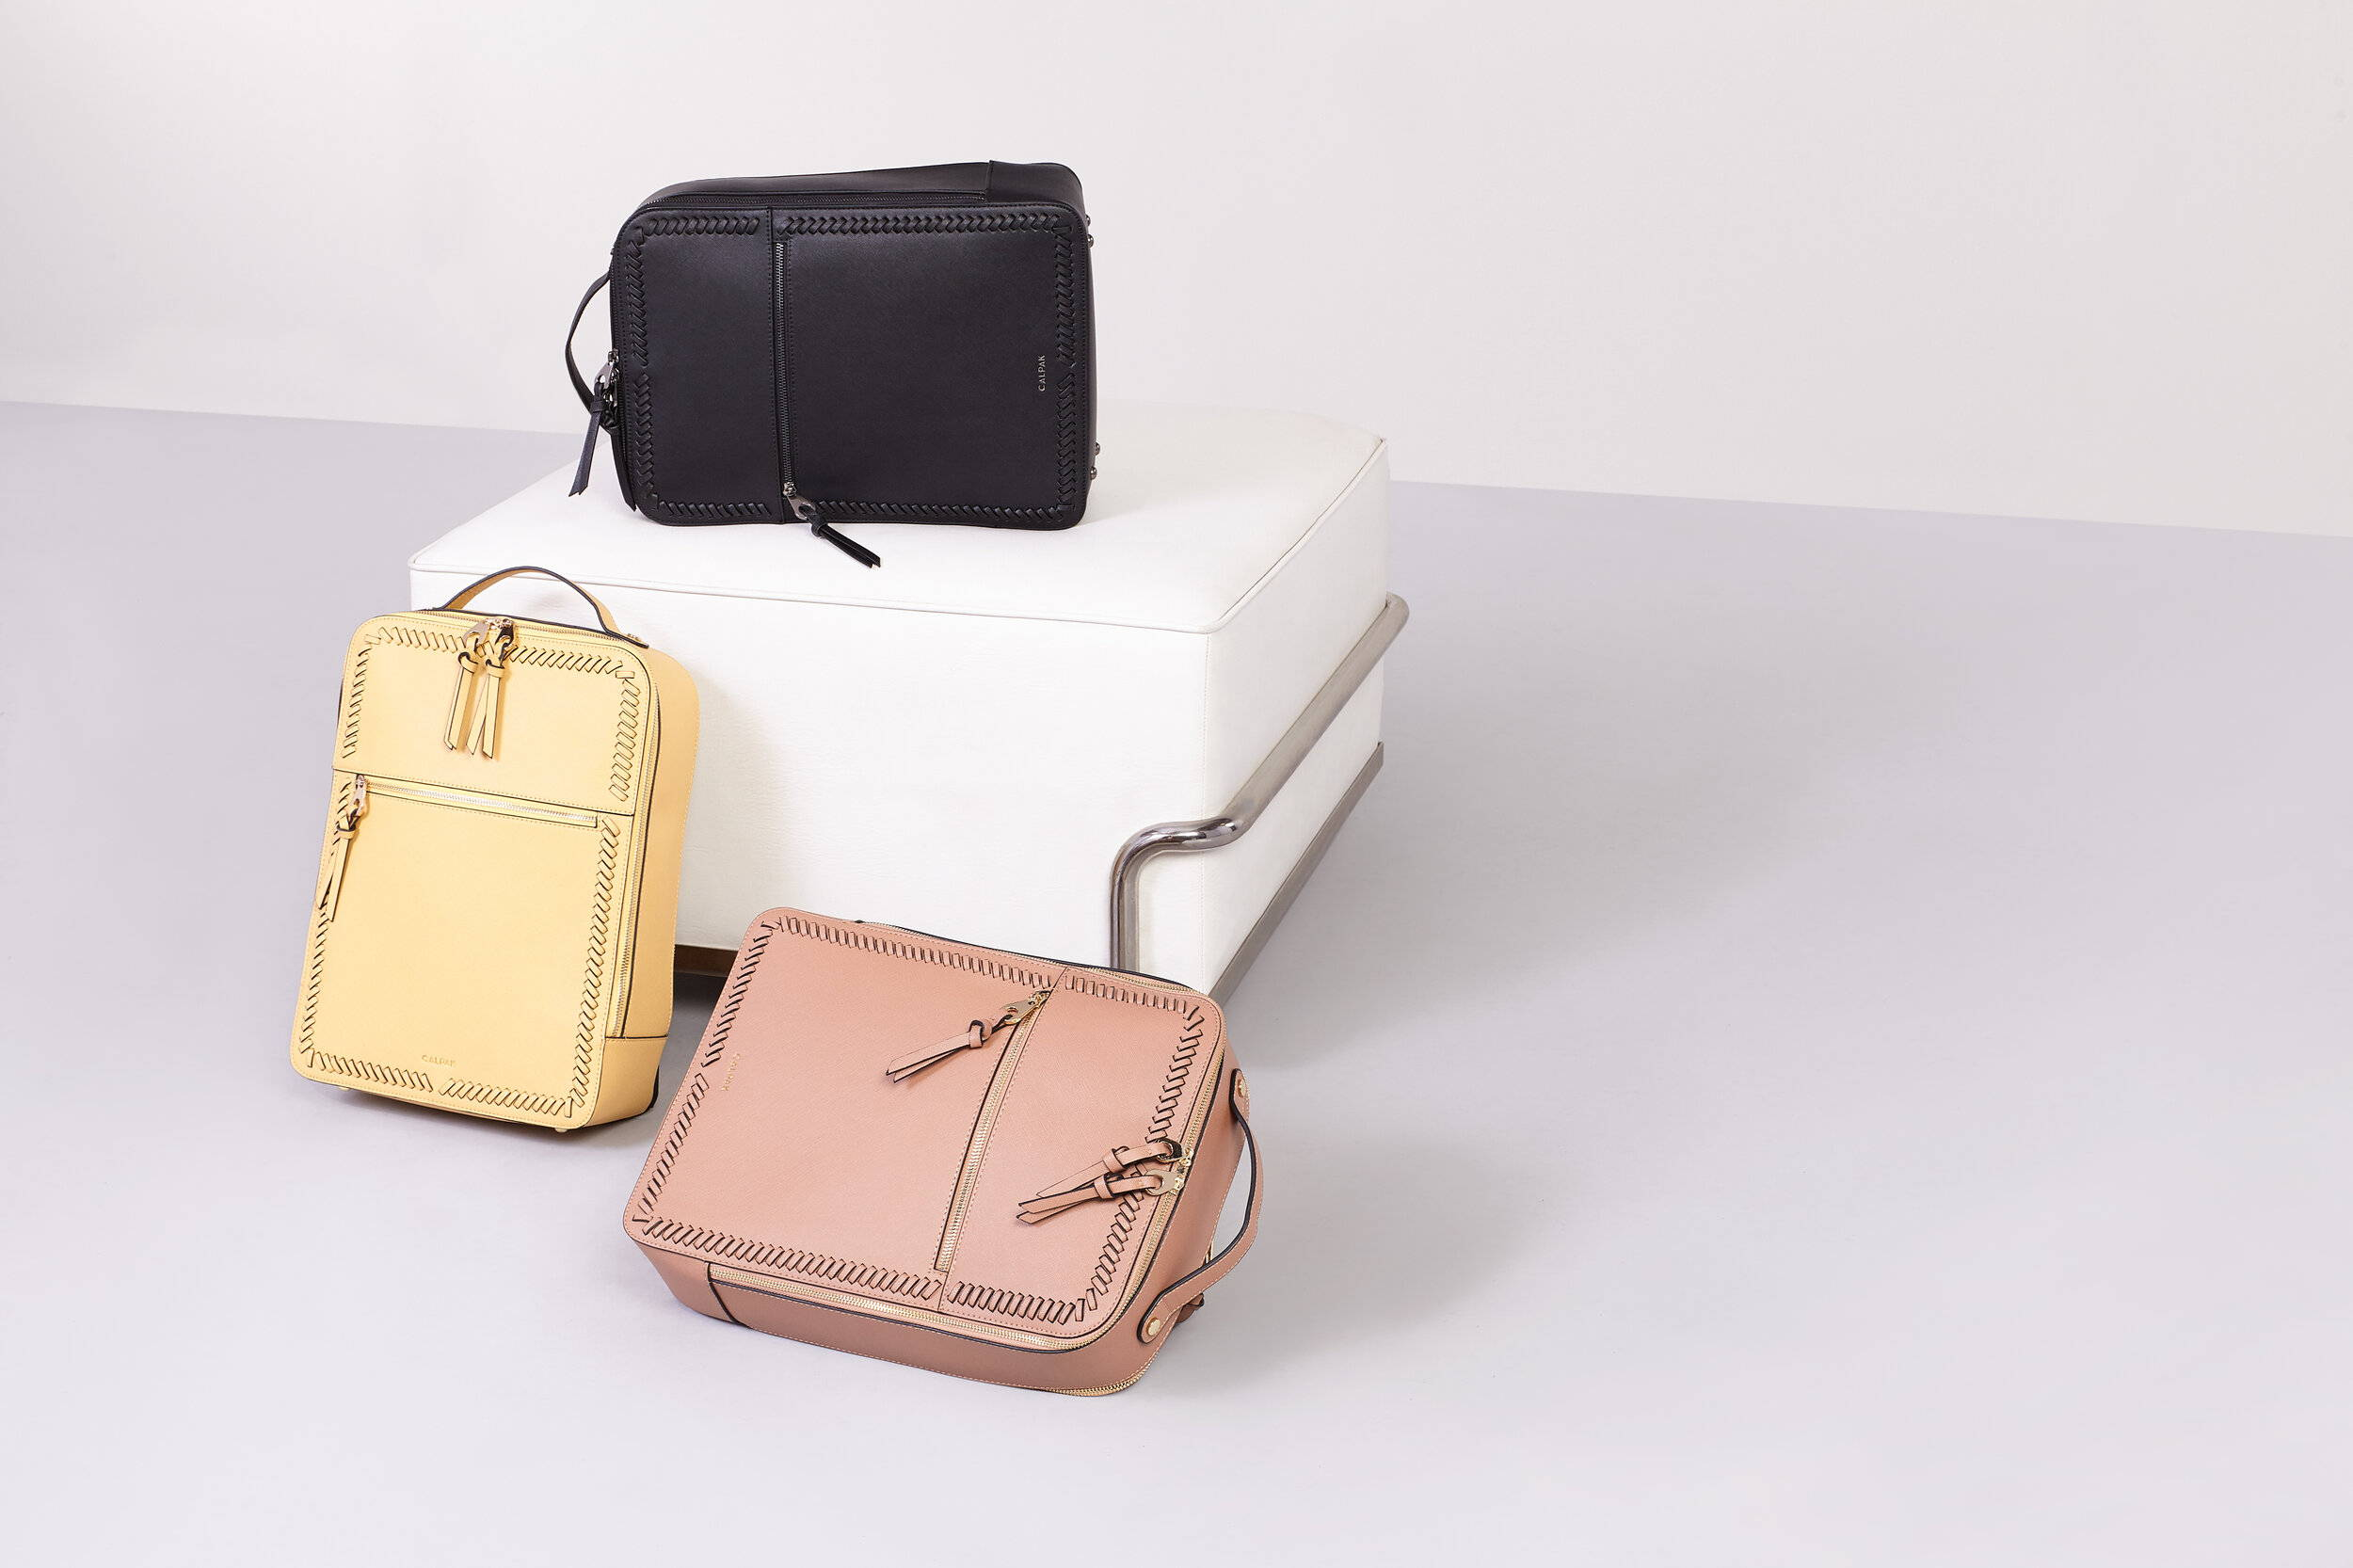 Kaya Laptop Backpack in Pear, Caramel and Gunmetal Black